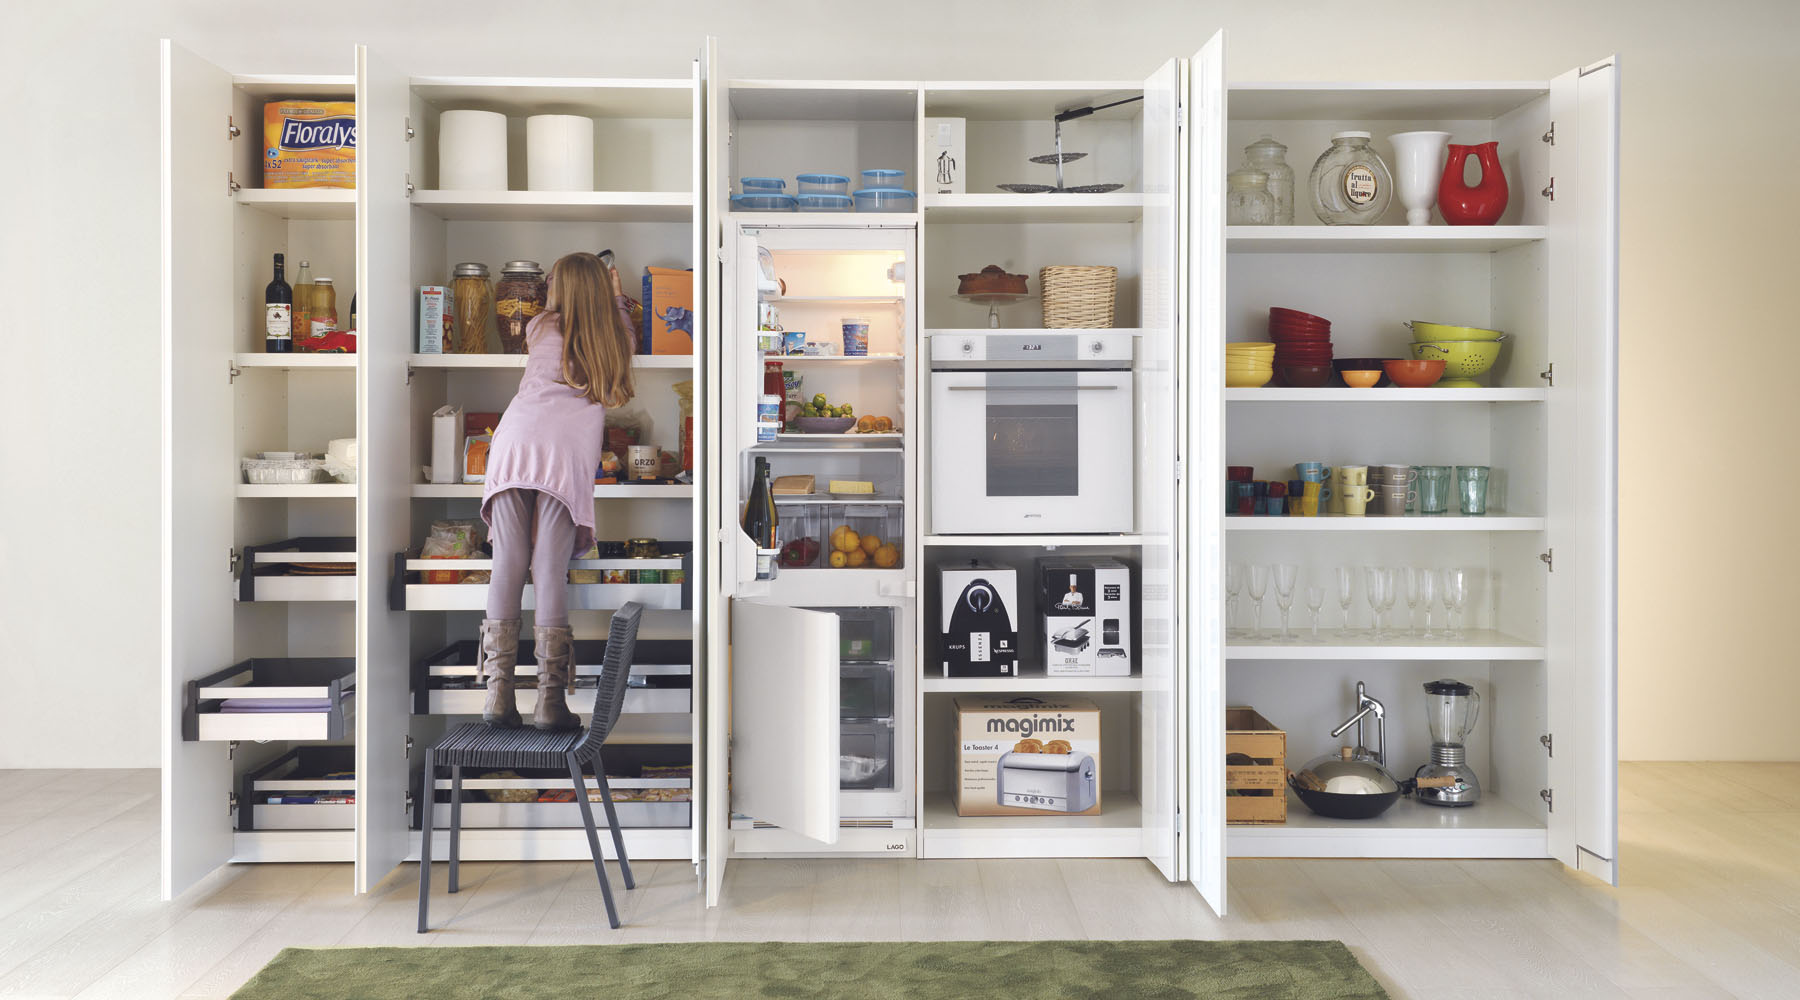 Cucine Per Bimbi Ikea ~ avienix.com for .